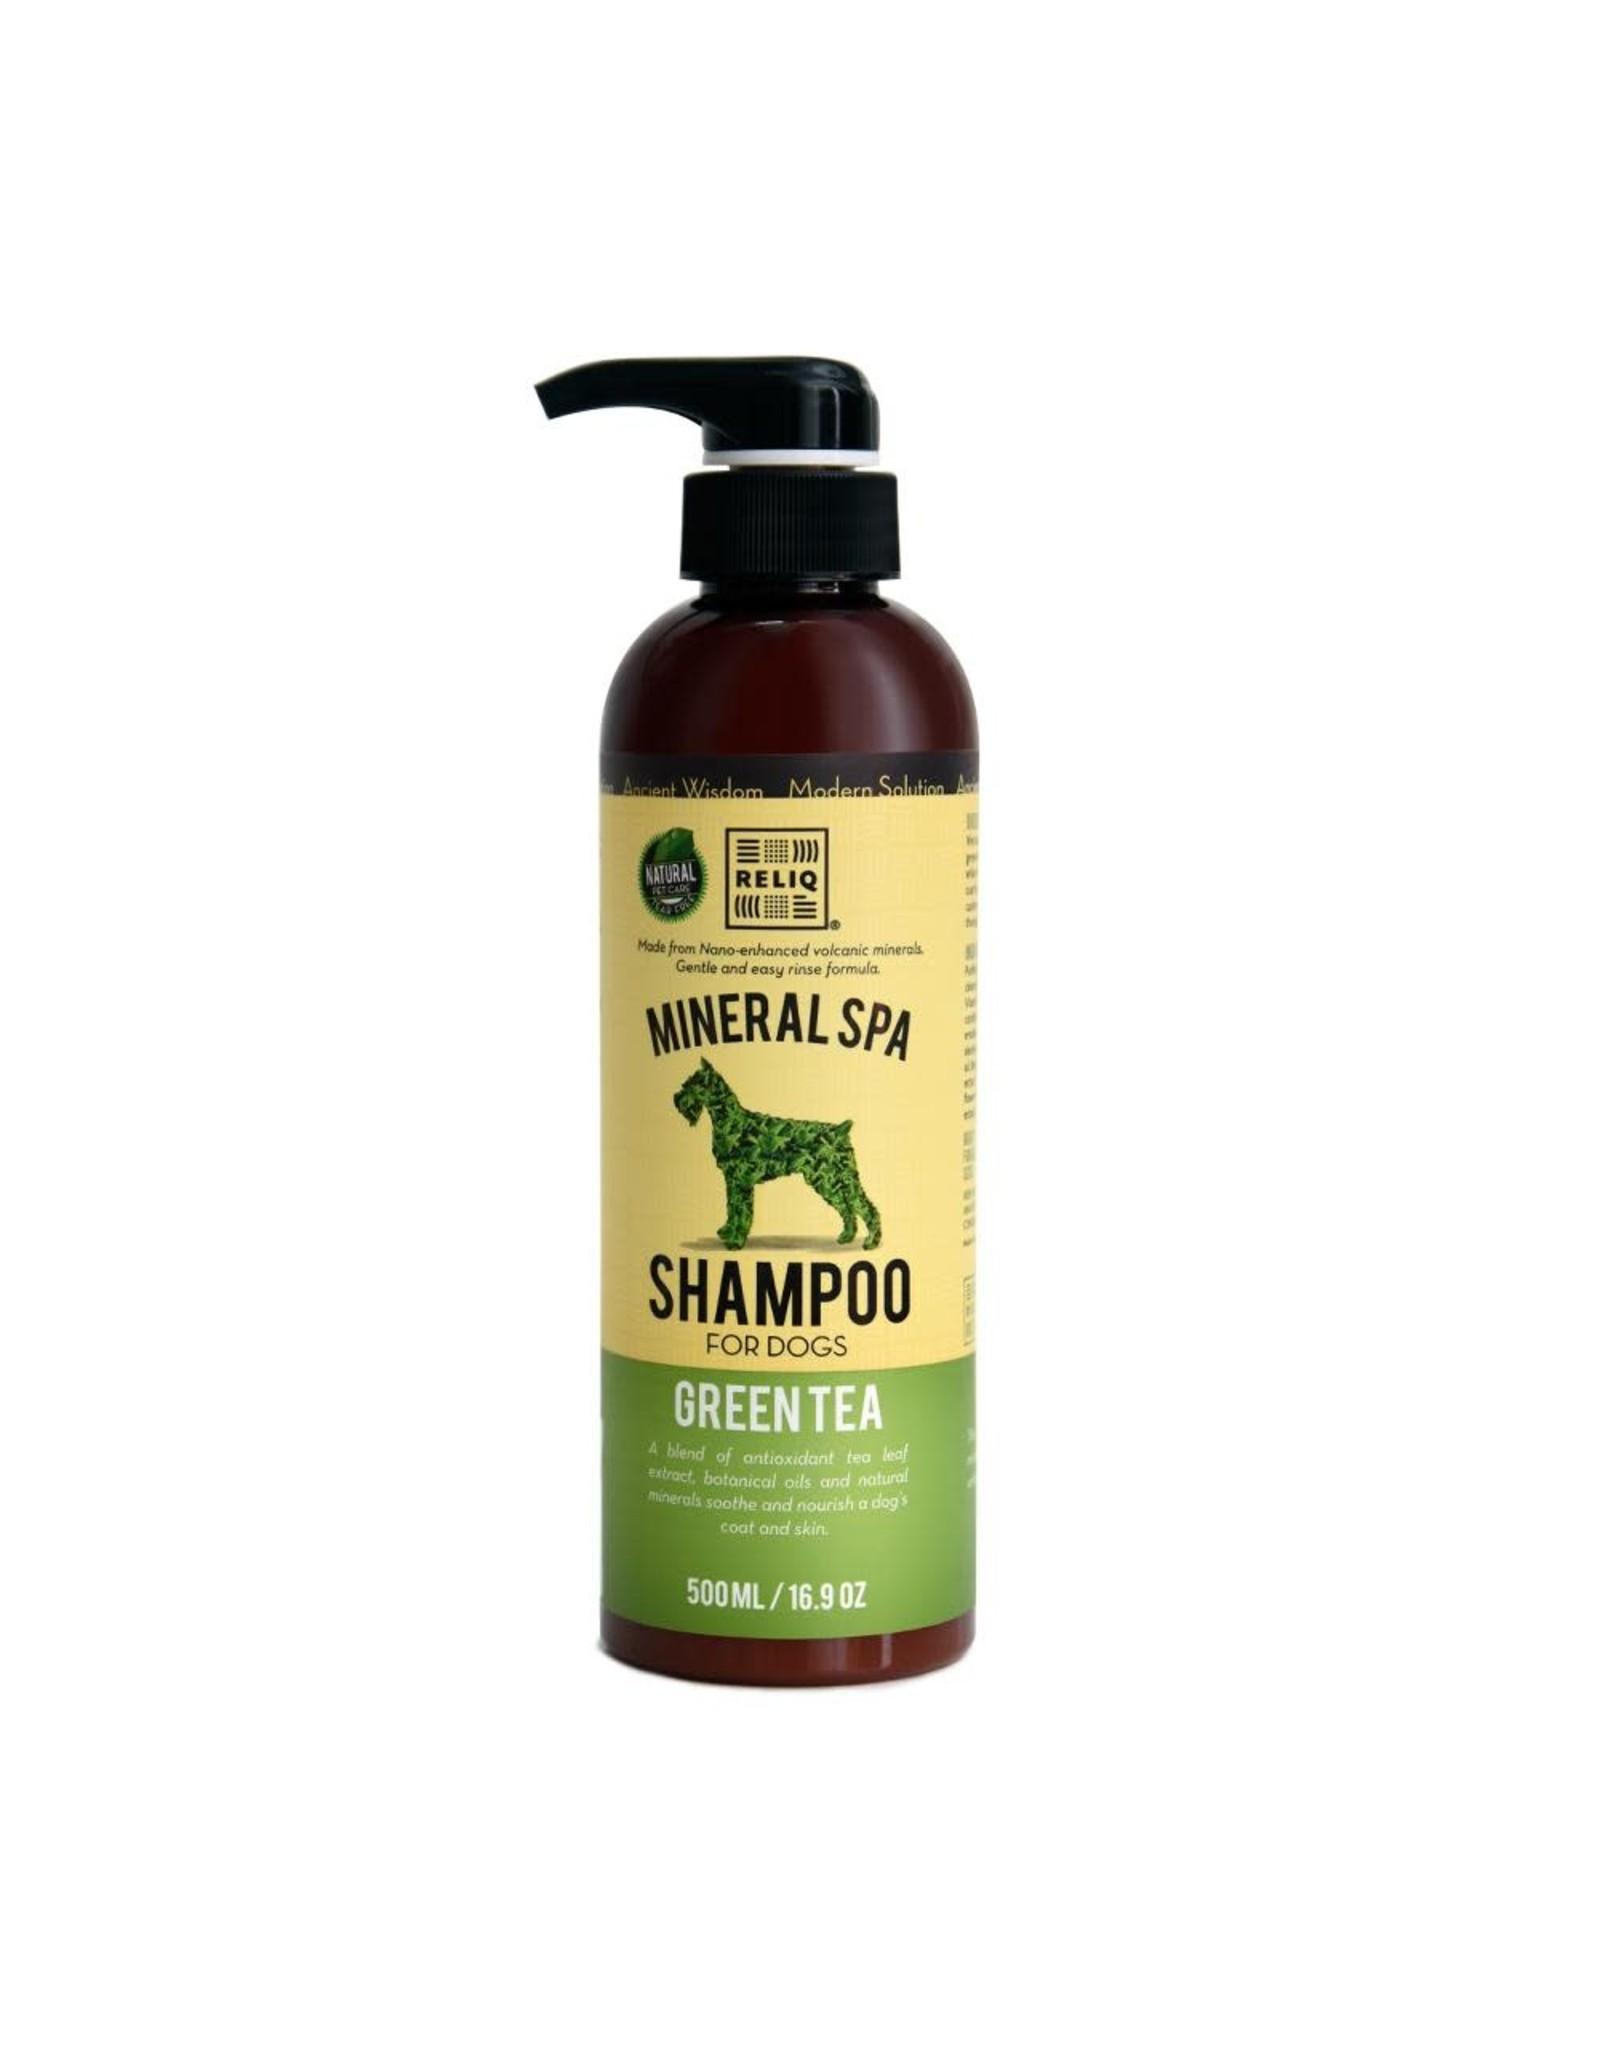 Mineral Spa Shampoo Green Tea 500ml